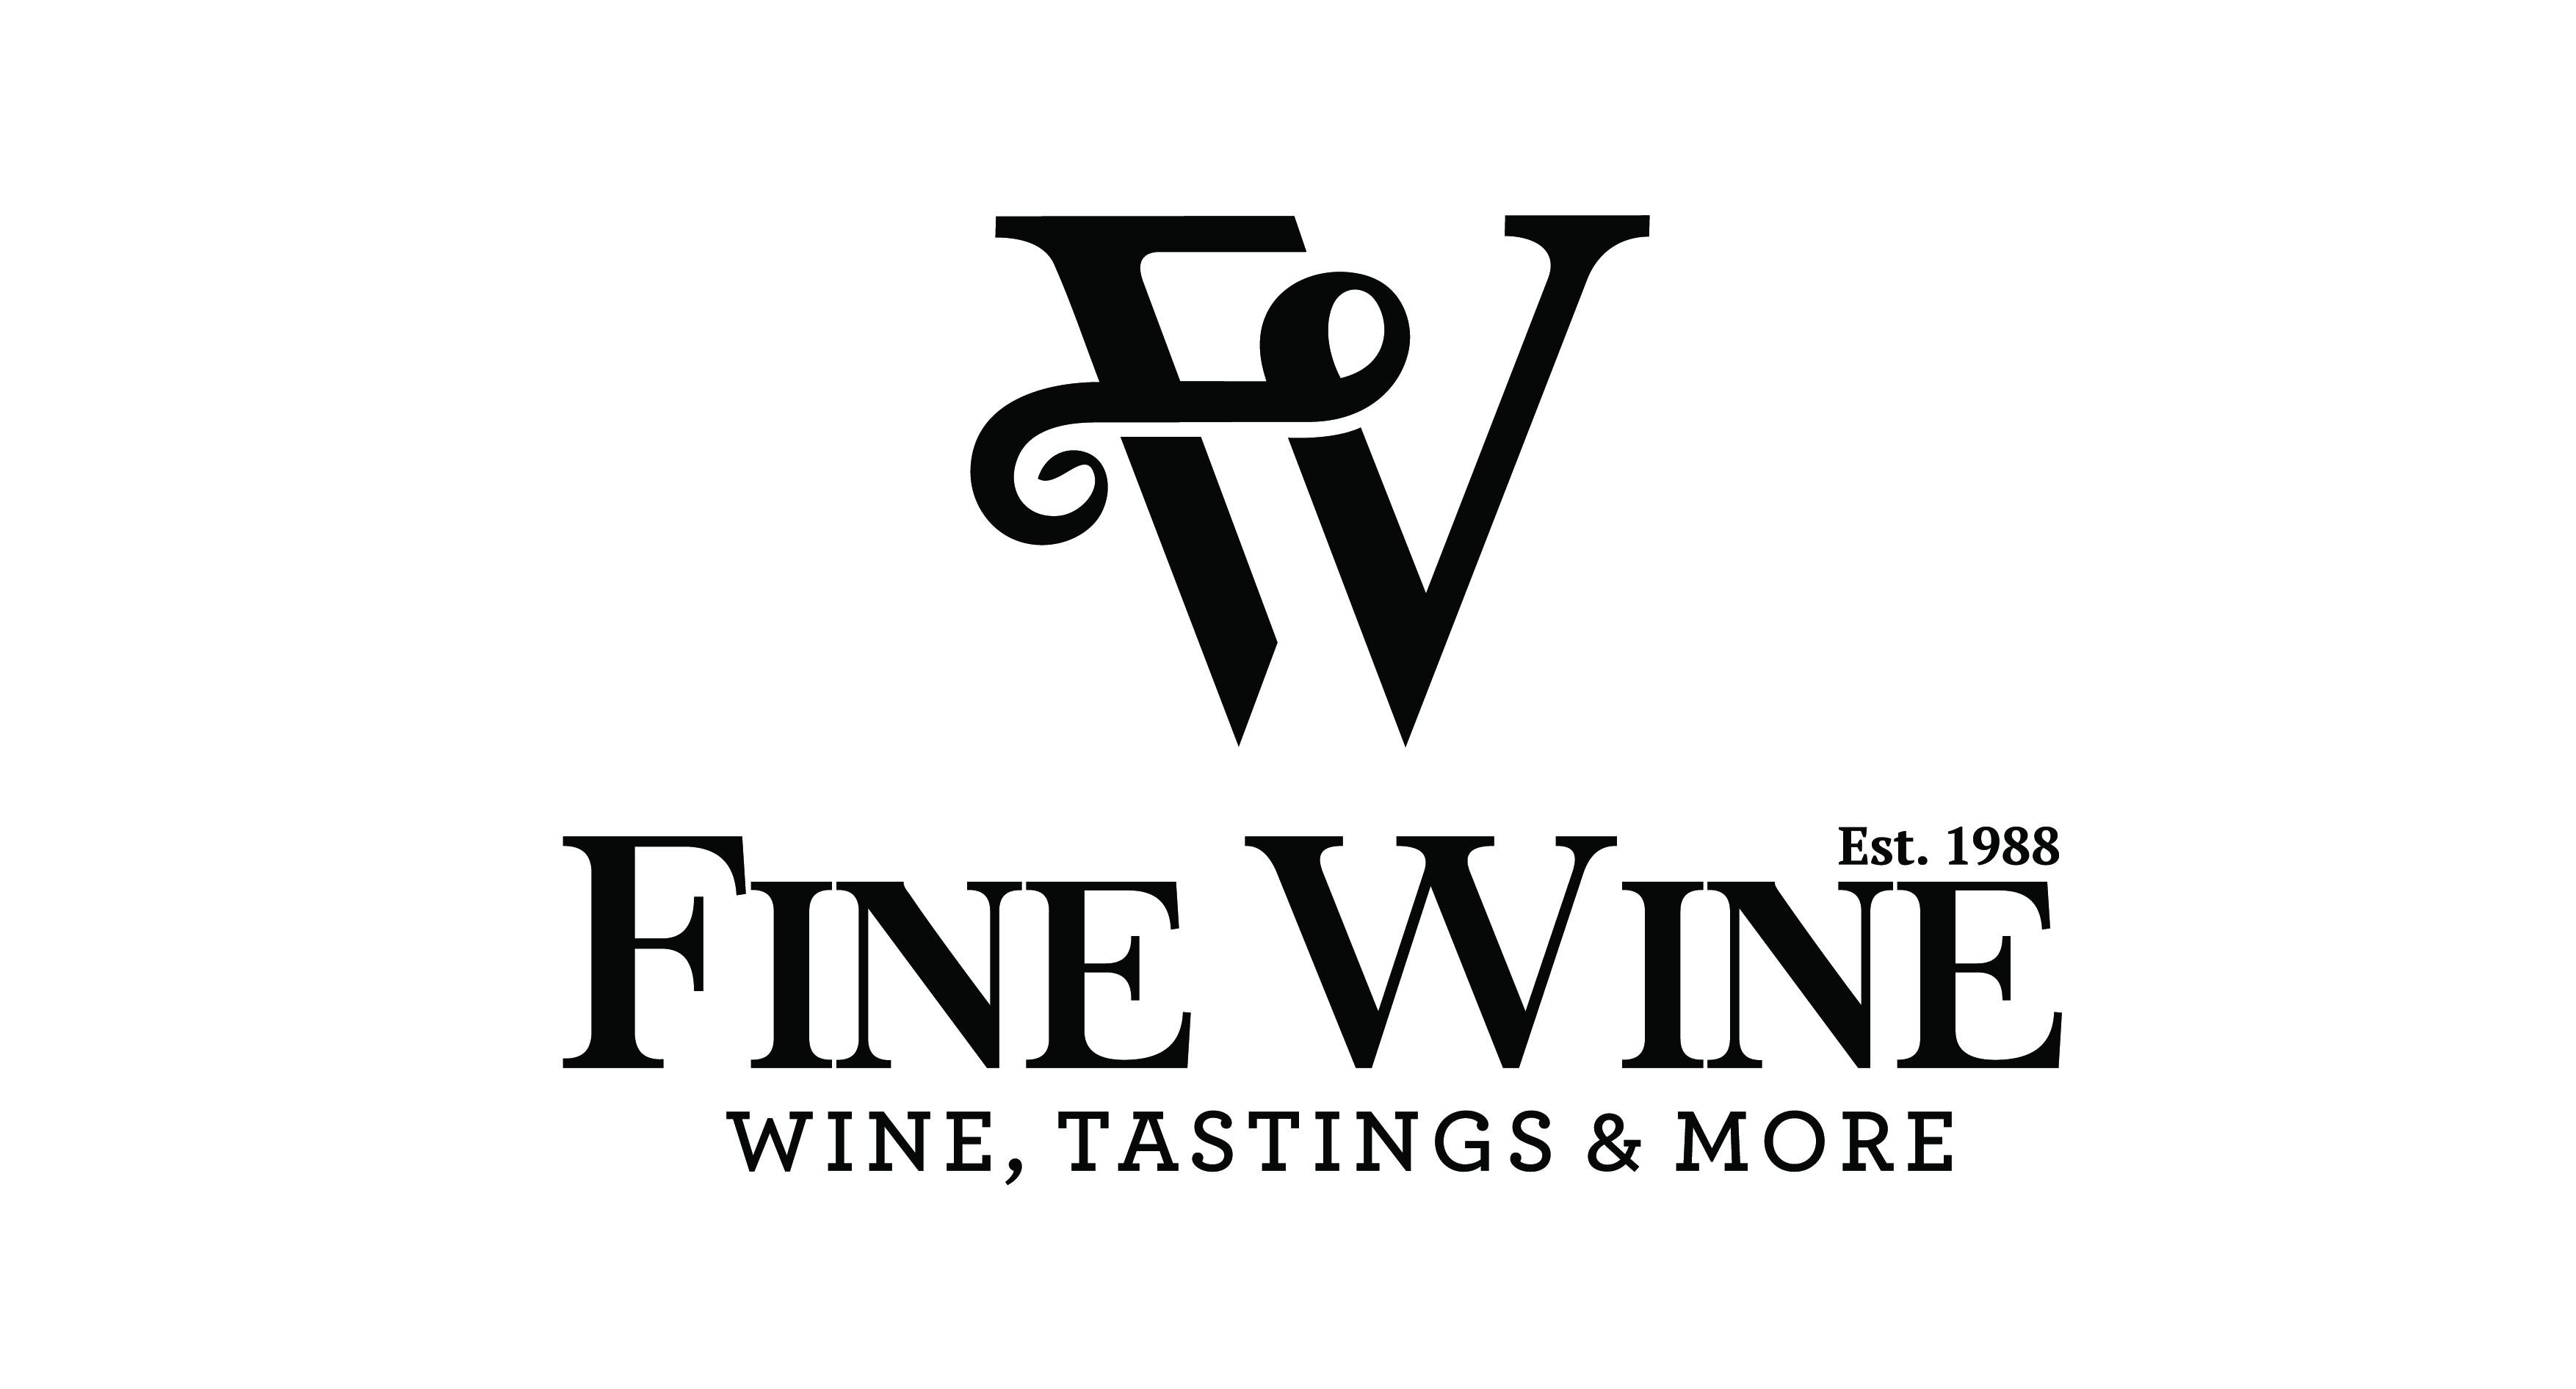 FINE WINE - Redesign our logo